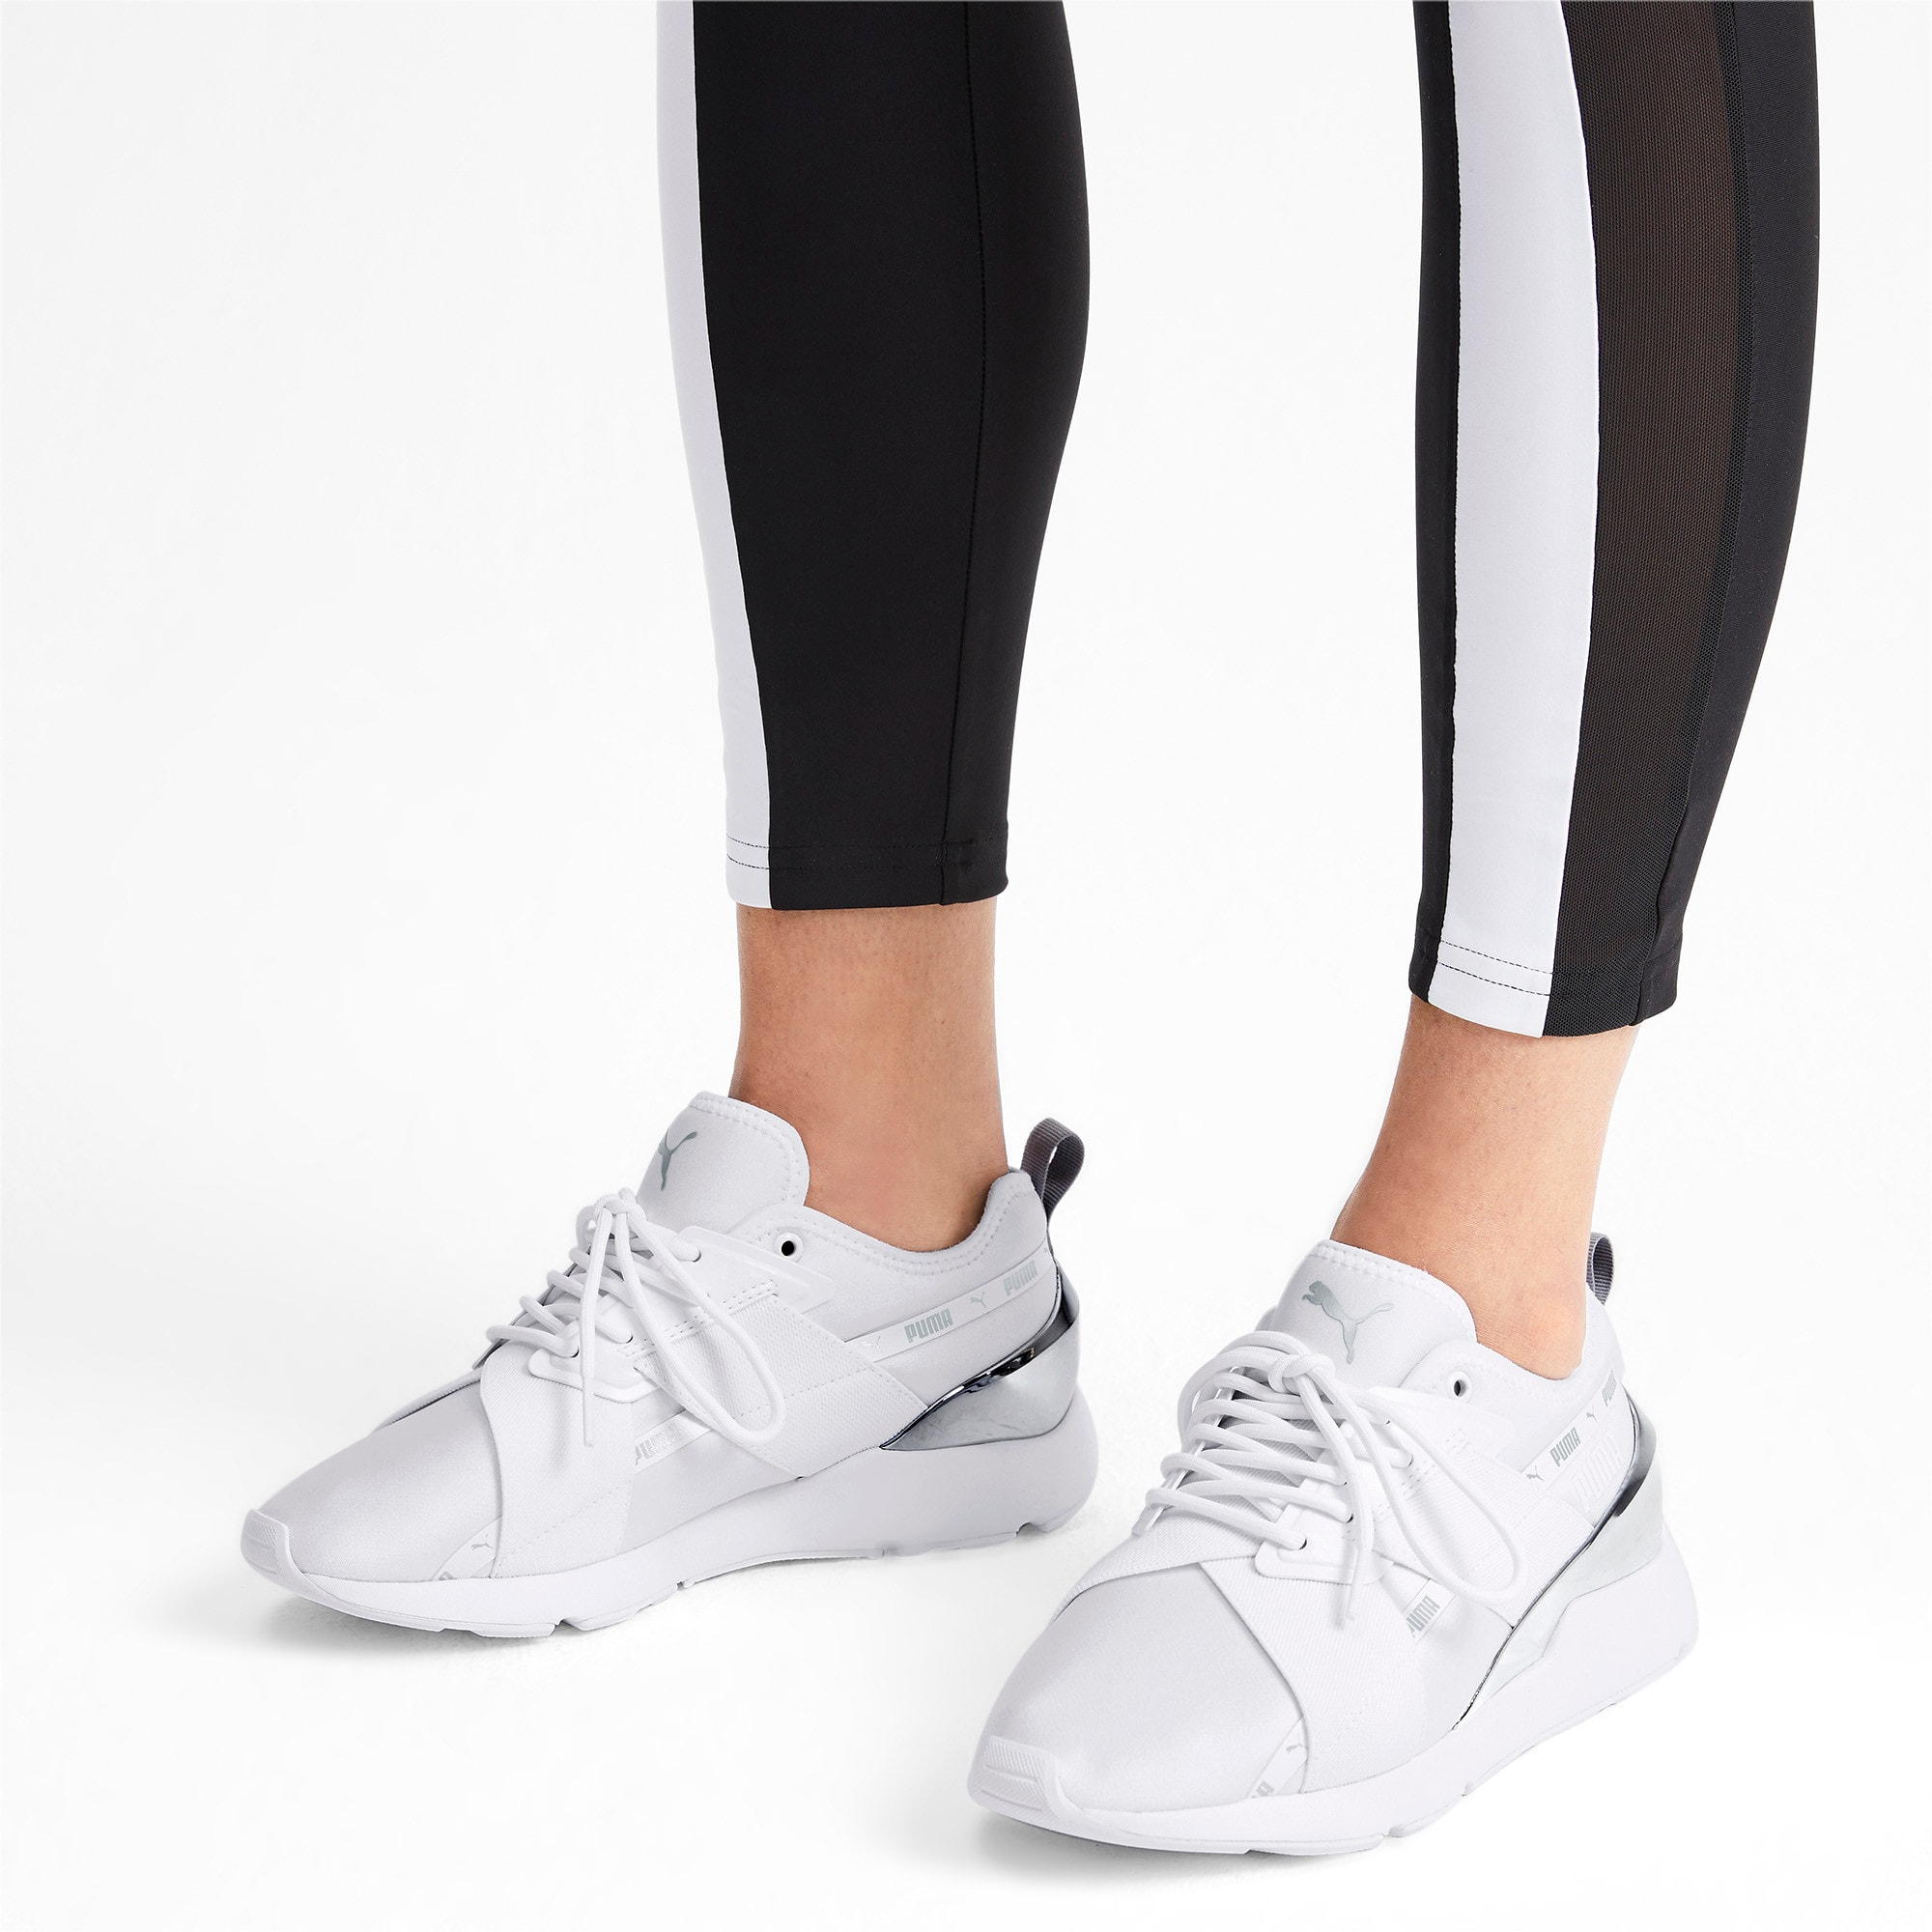 Thumbnail 2 of Muse X-2 Metallic Women's Sneakers, Puma White, medium